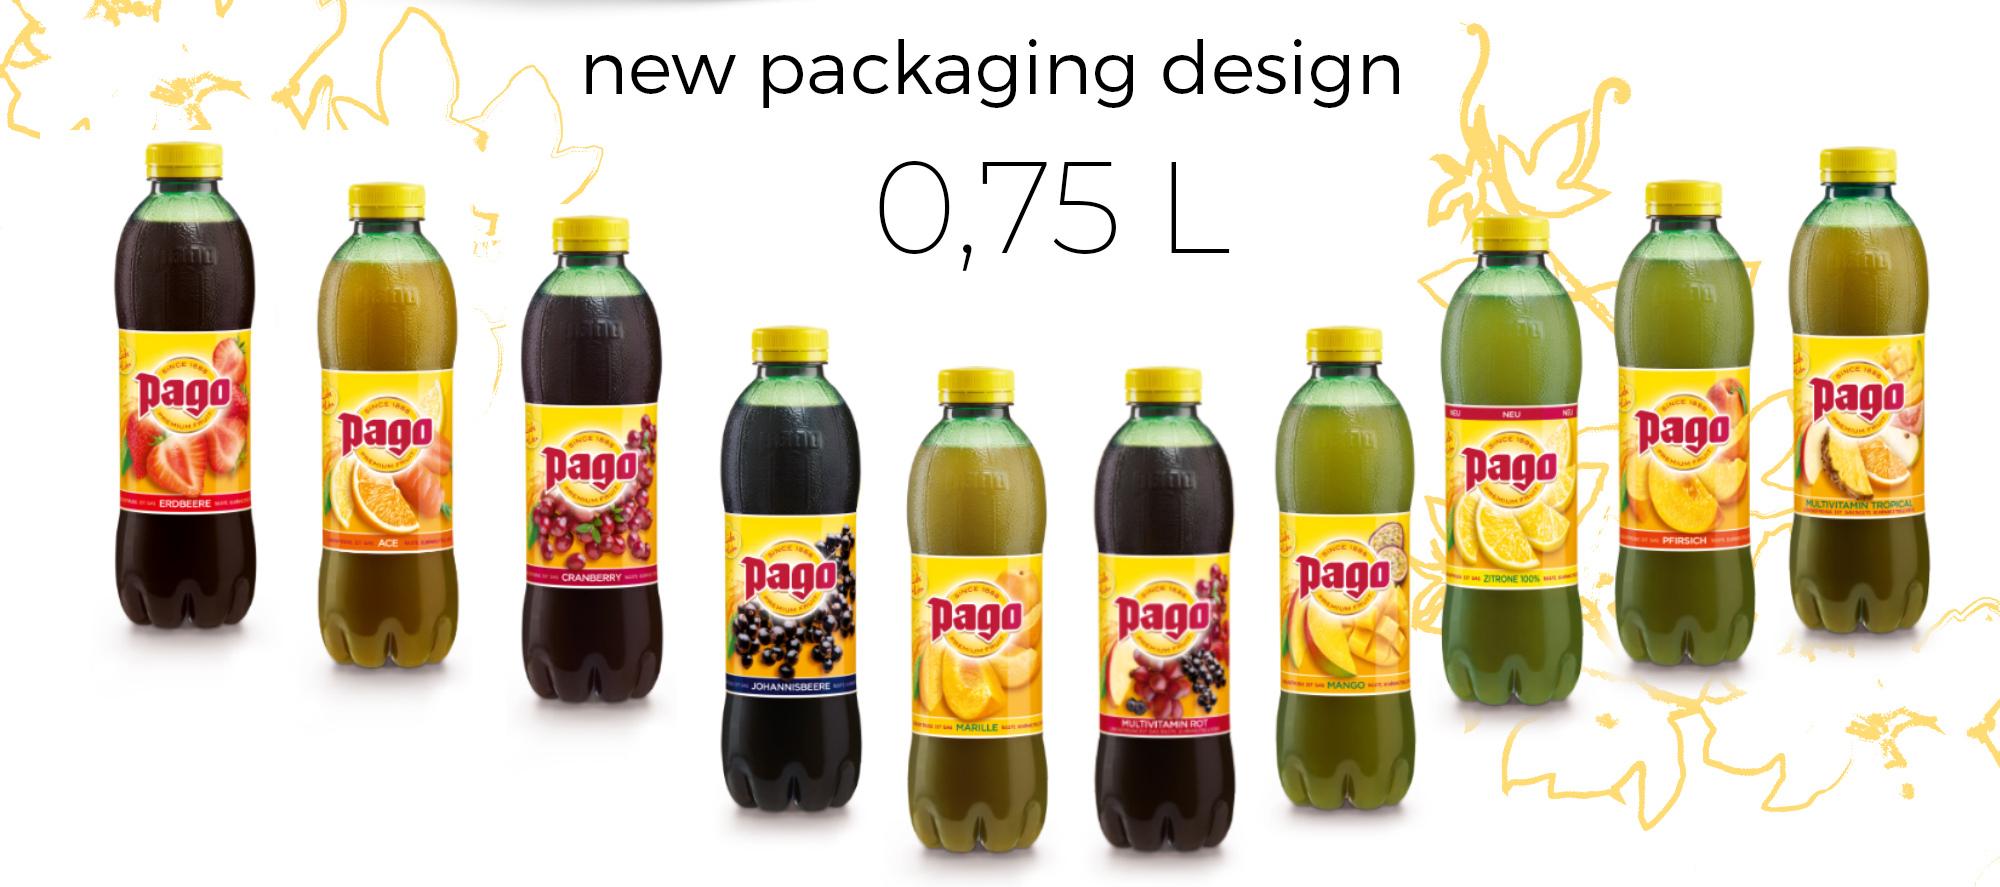 Pago4